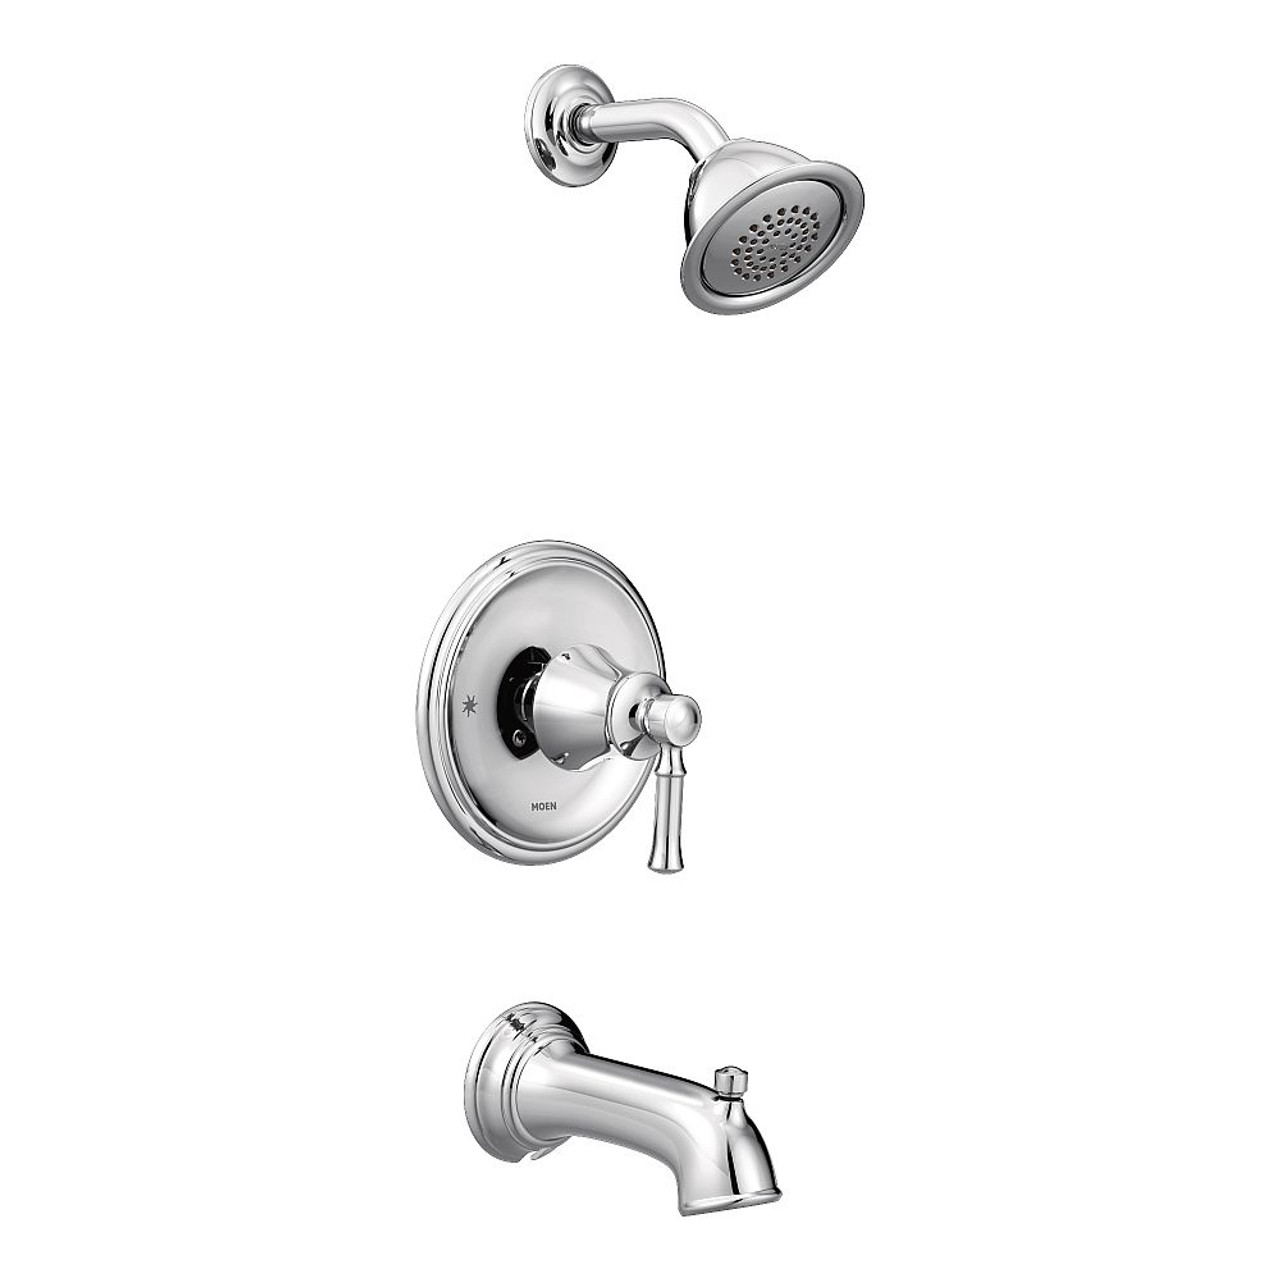 MOEN Align Single-Handle Posi-Temp Tub and Shower Faucet Trim Kit in Chrome